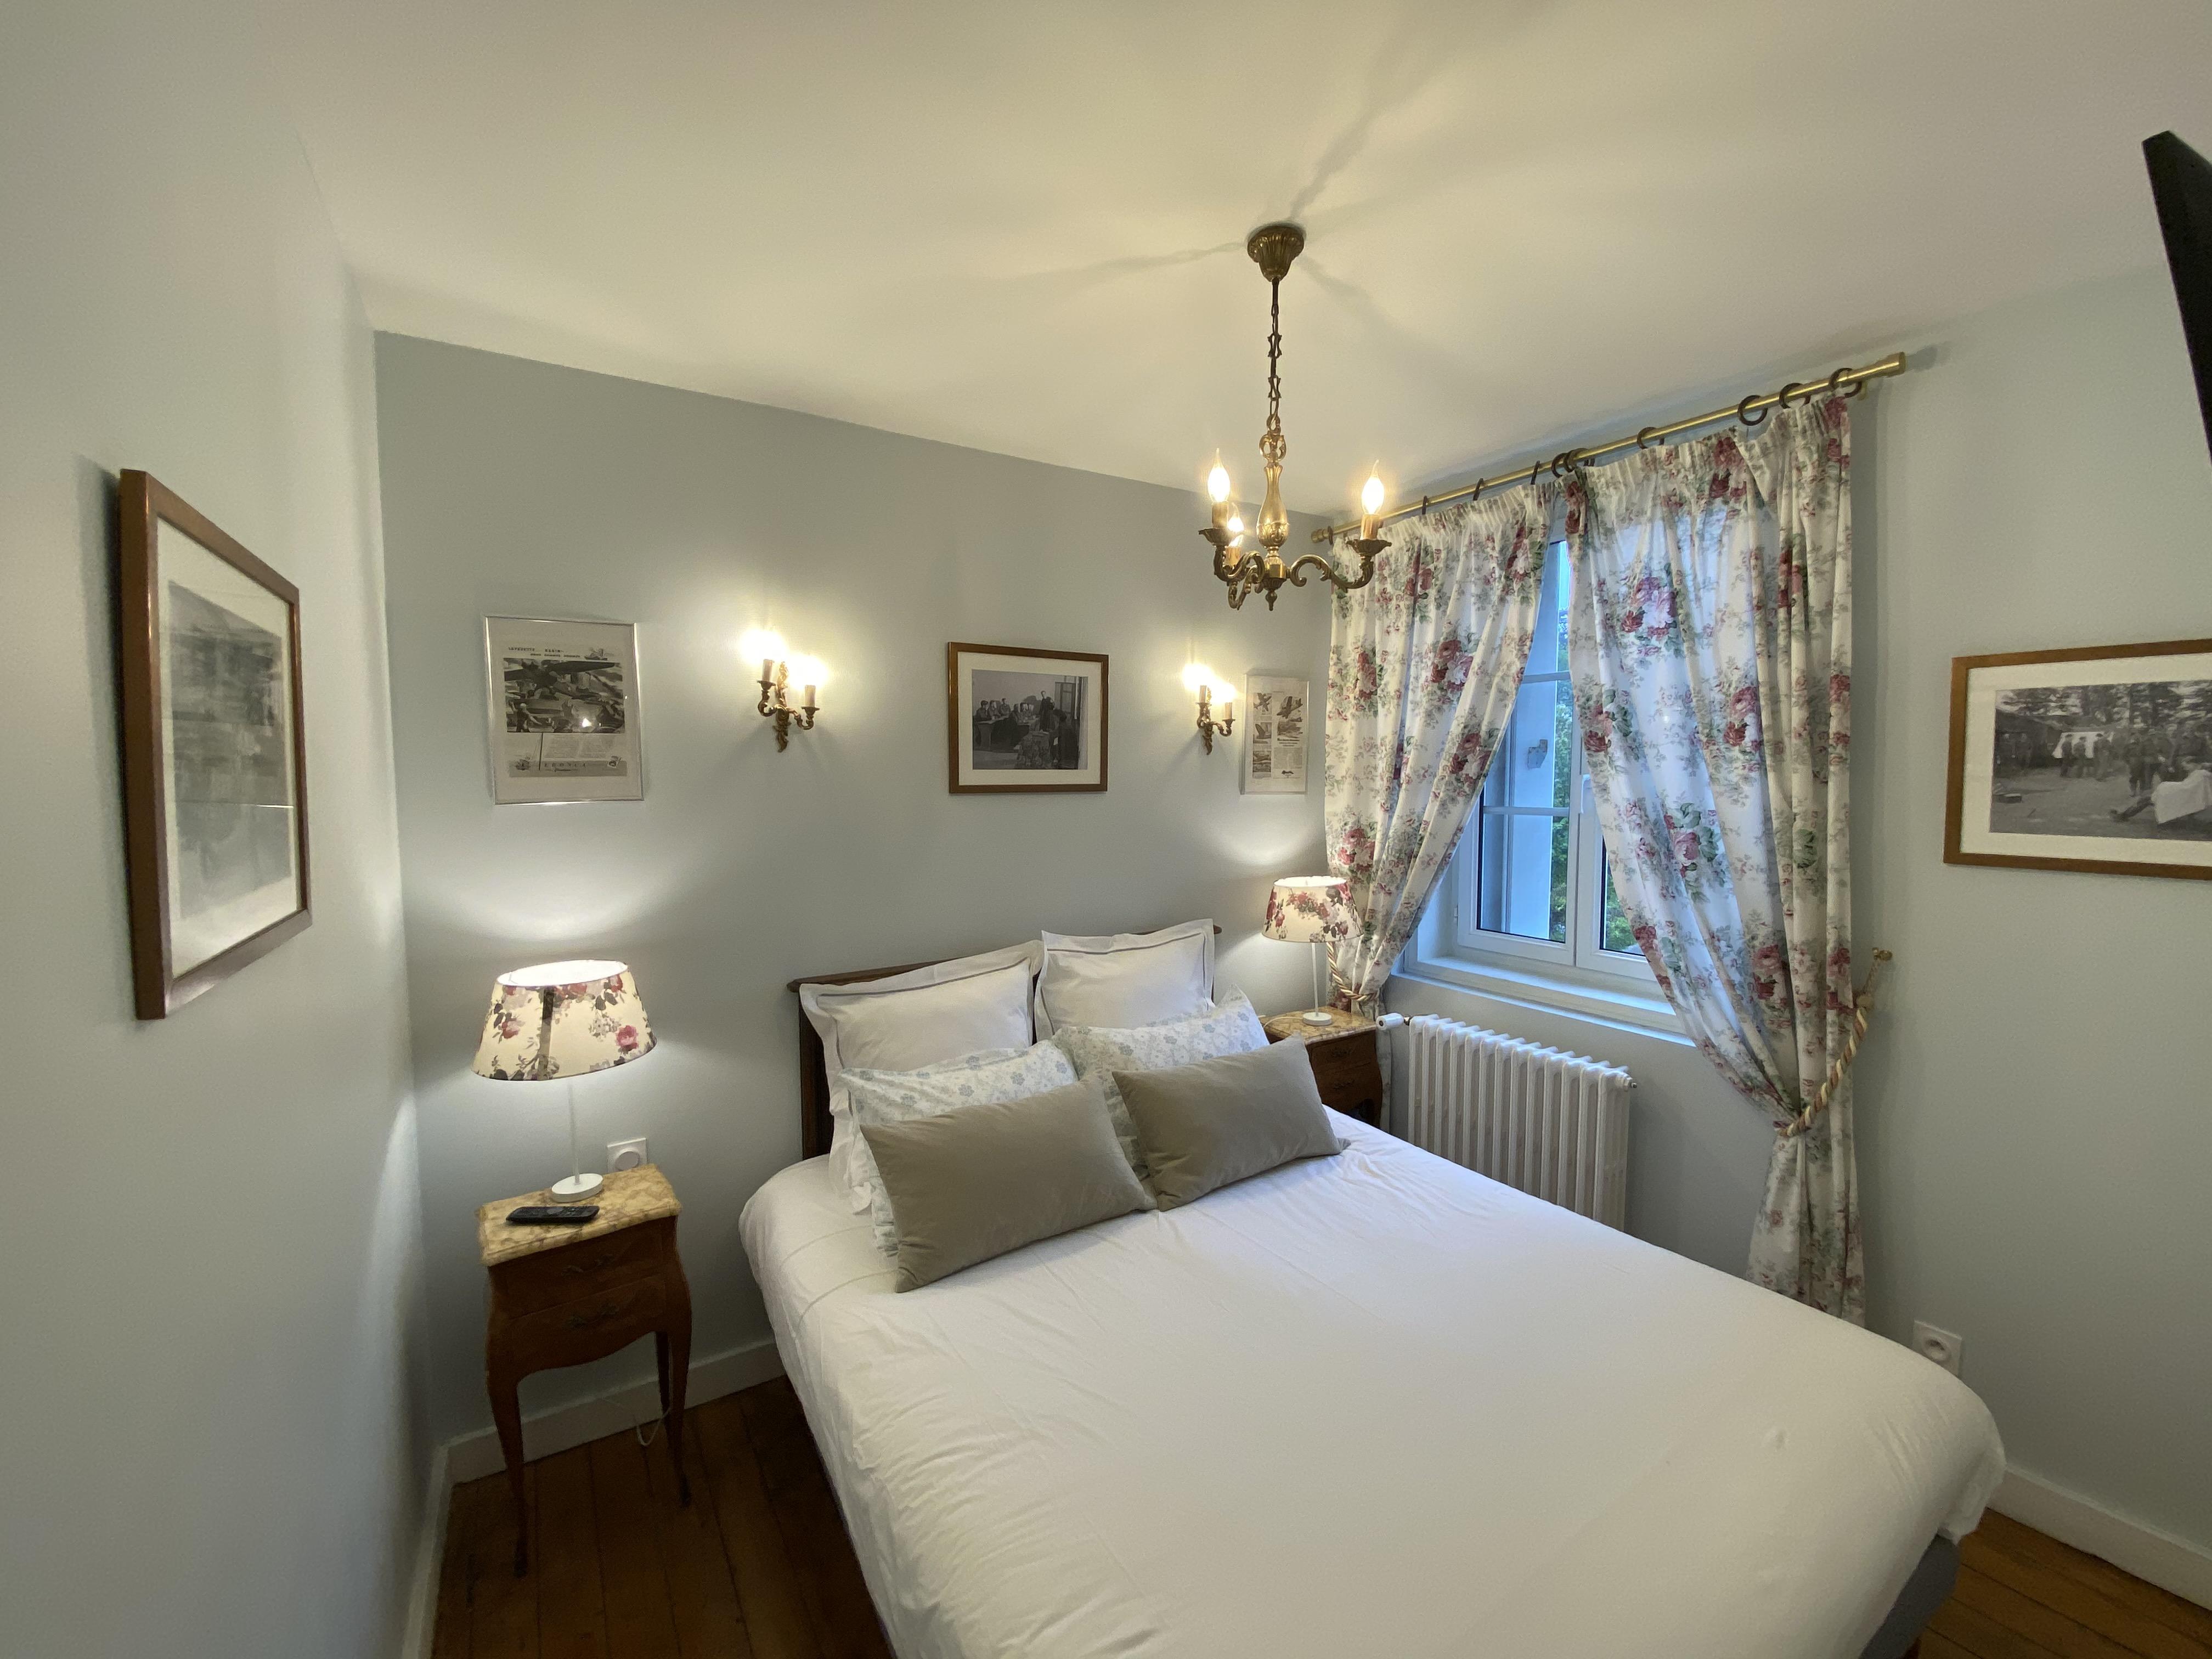 DDAY AVIATORS Le Manoir Room B7